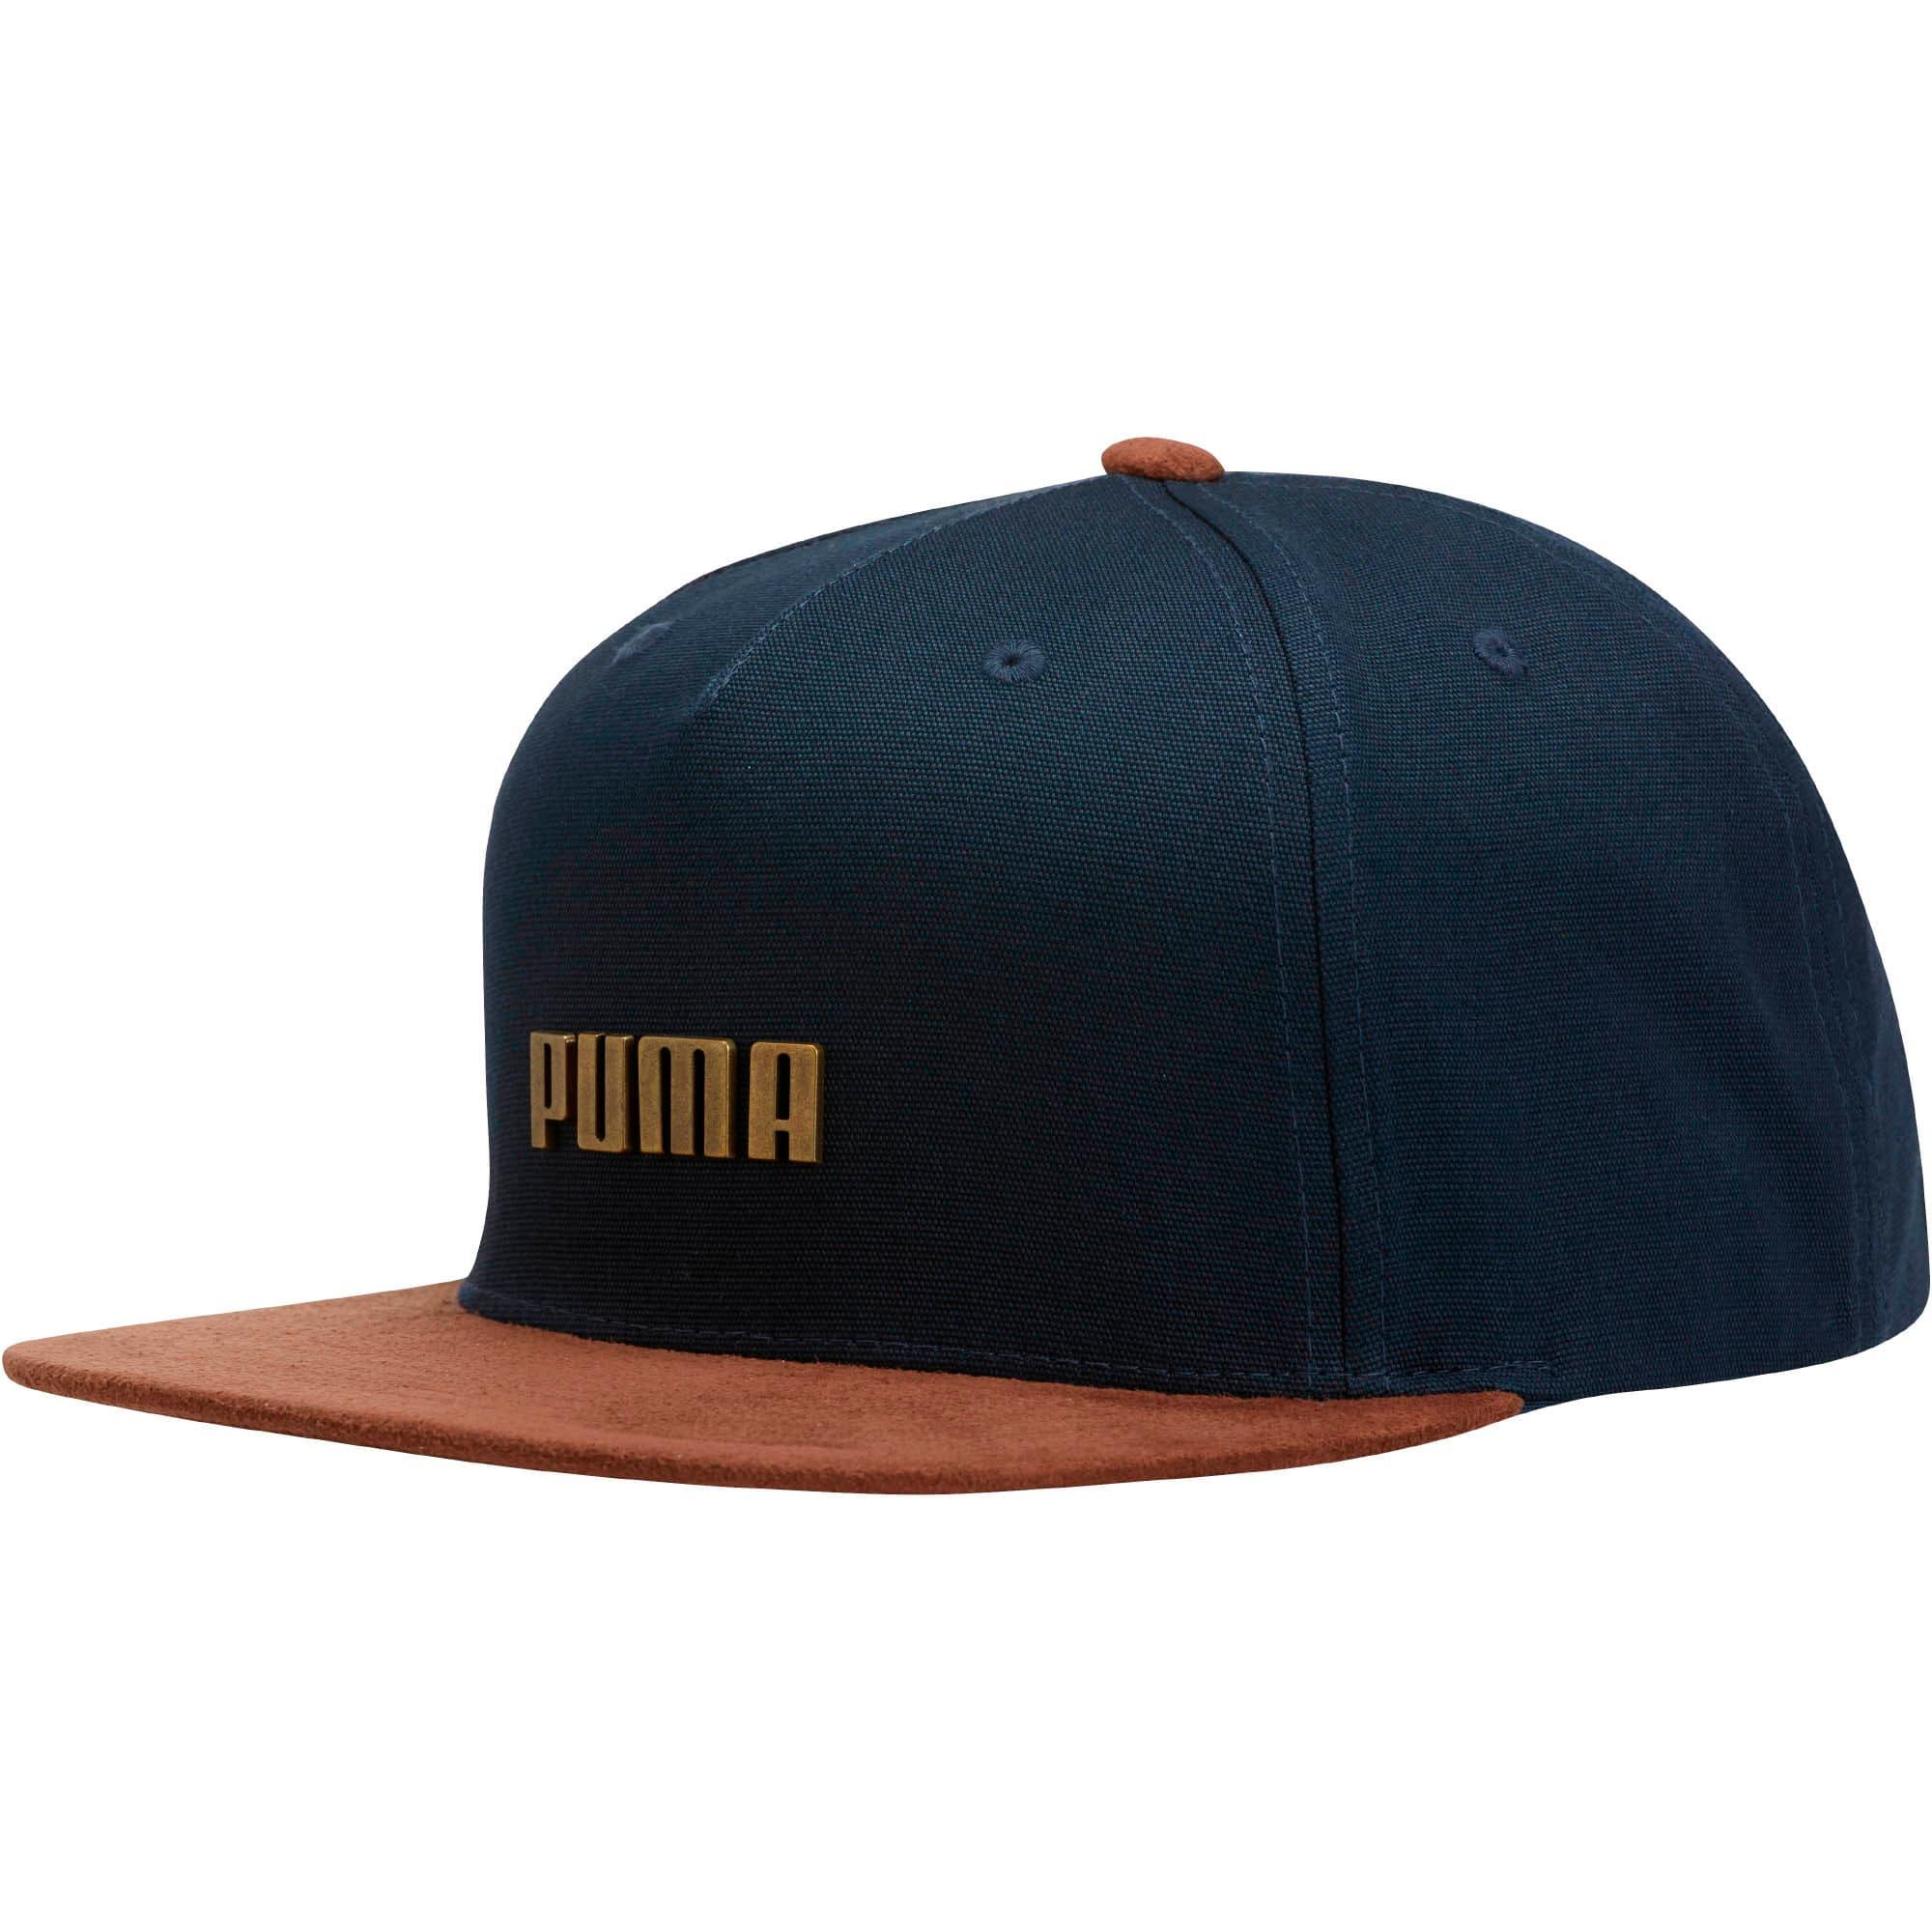 Thumbnail 1 of PUMA Letterman Flatbill Adjustable Hat, Navy, medium